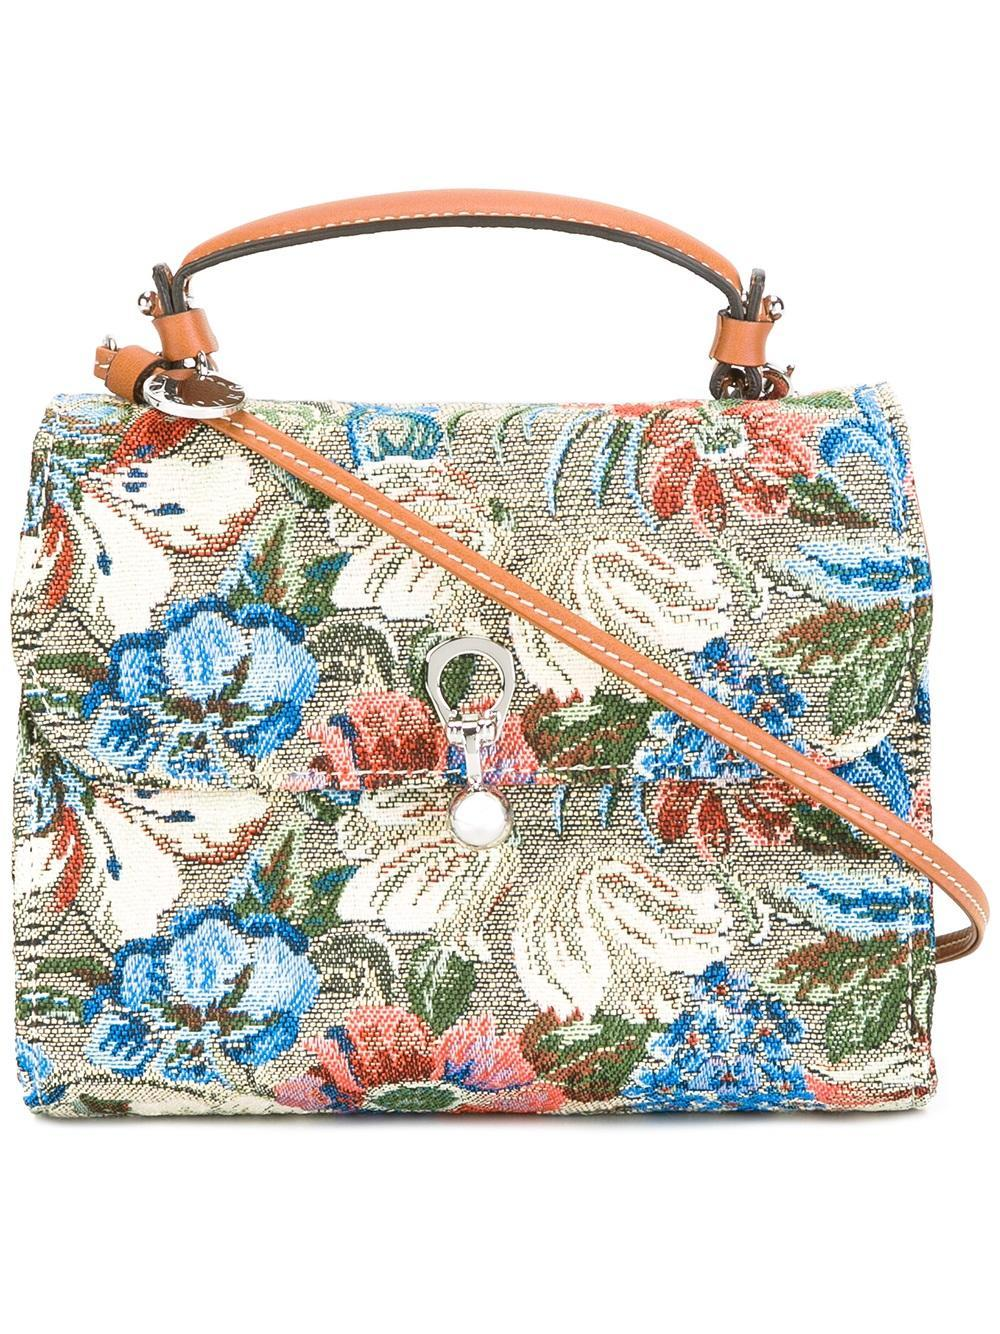 Ermanno Scervino Floral Print Crossbody Bag In Blue | Lyst